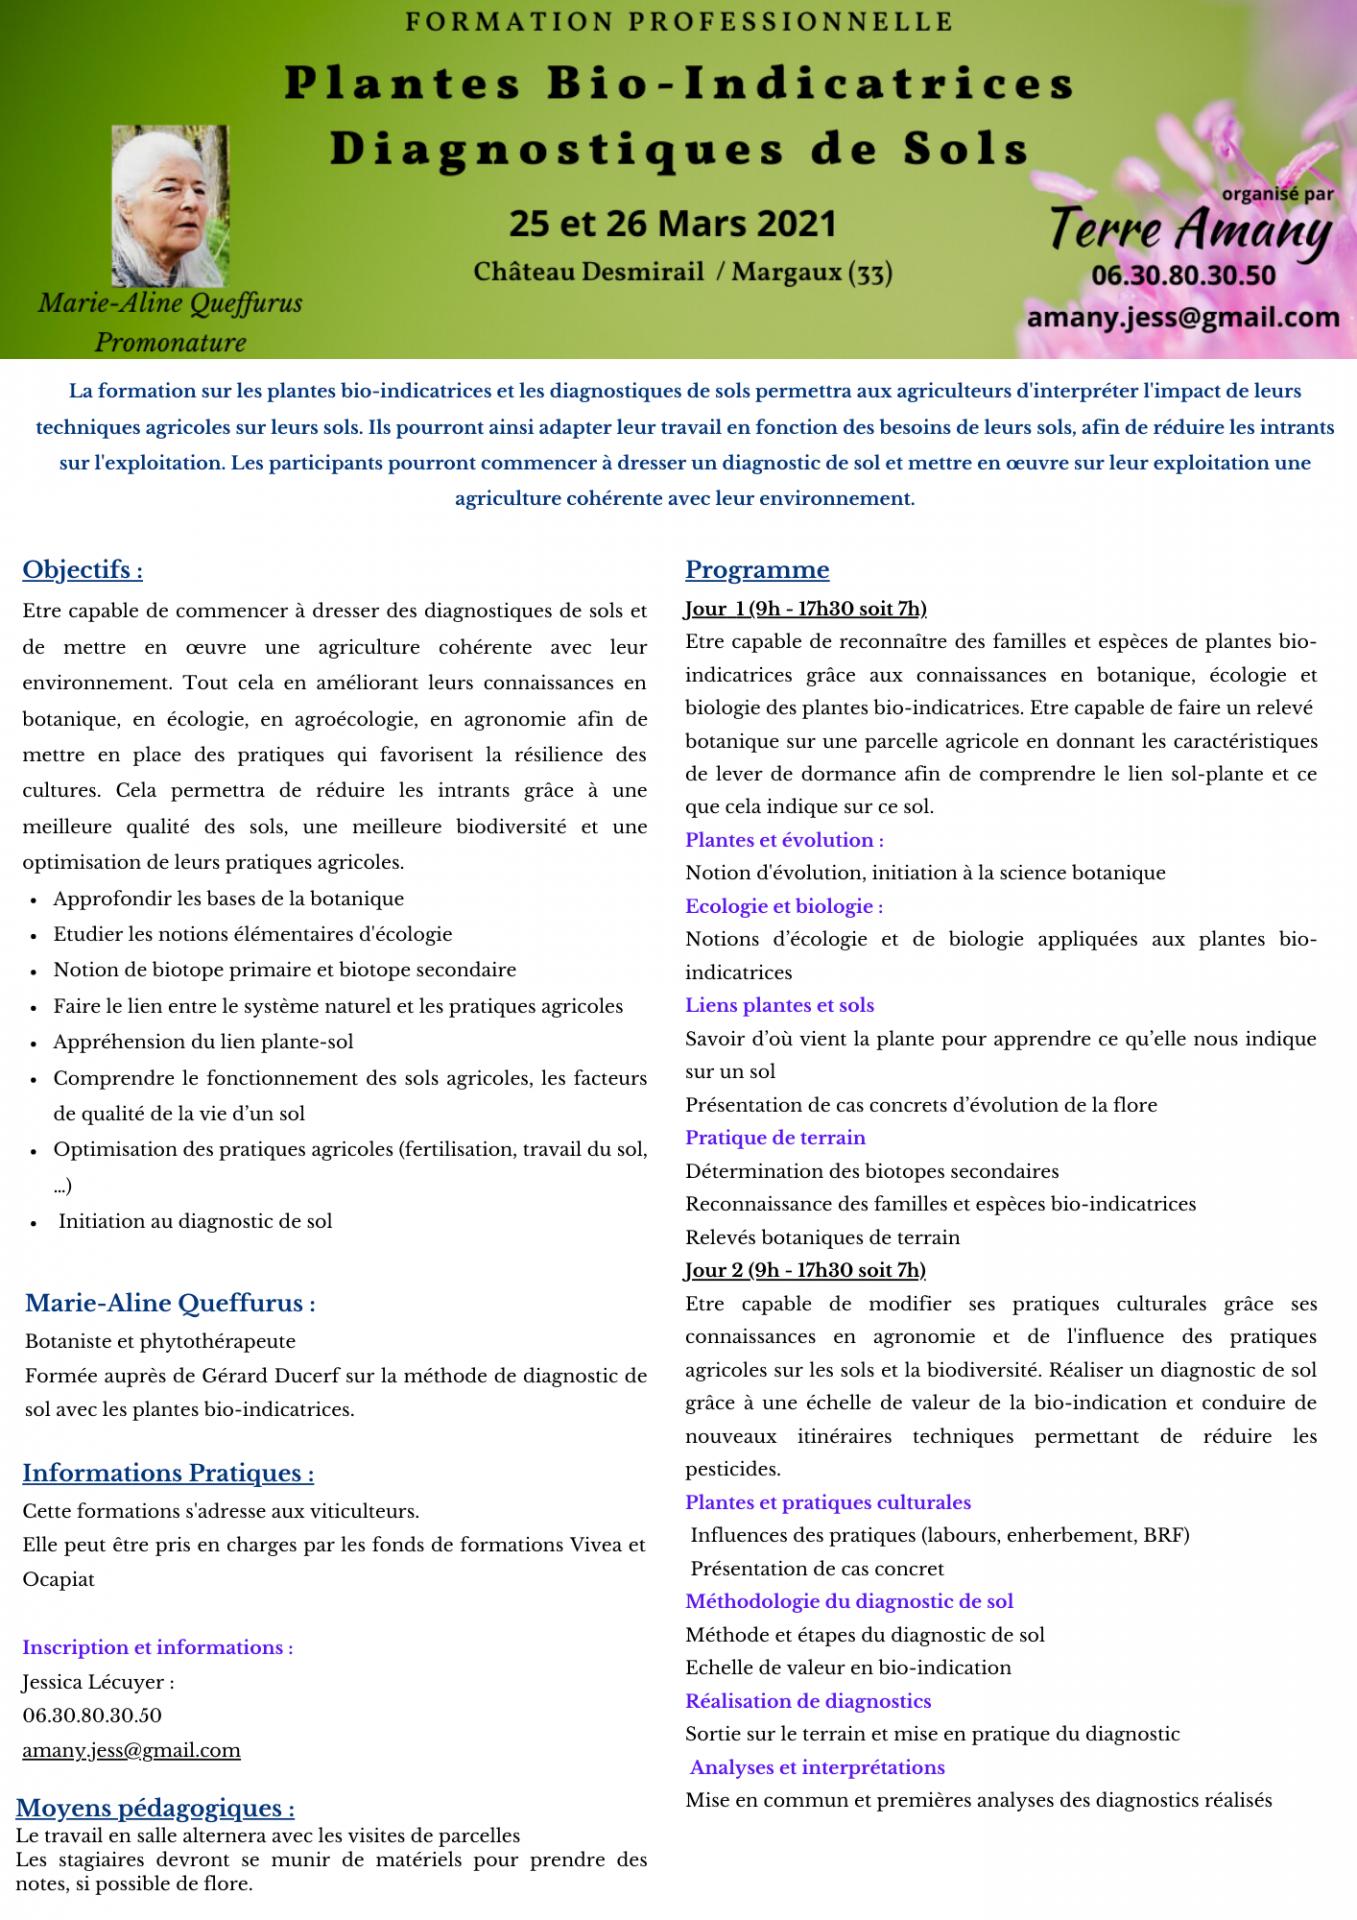 Programme formation plantes bio indicatrices